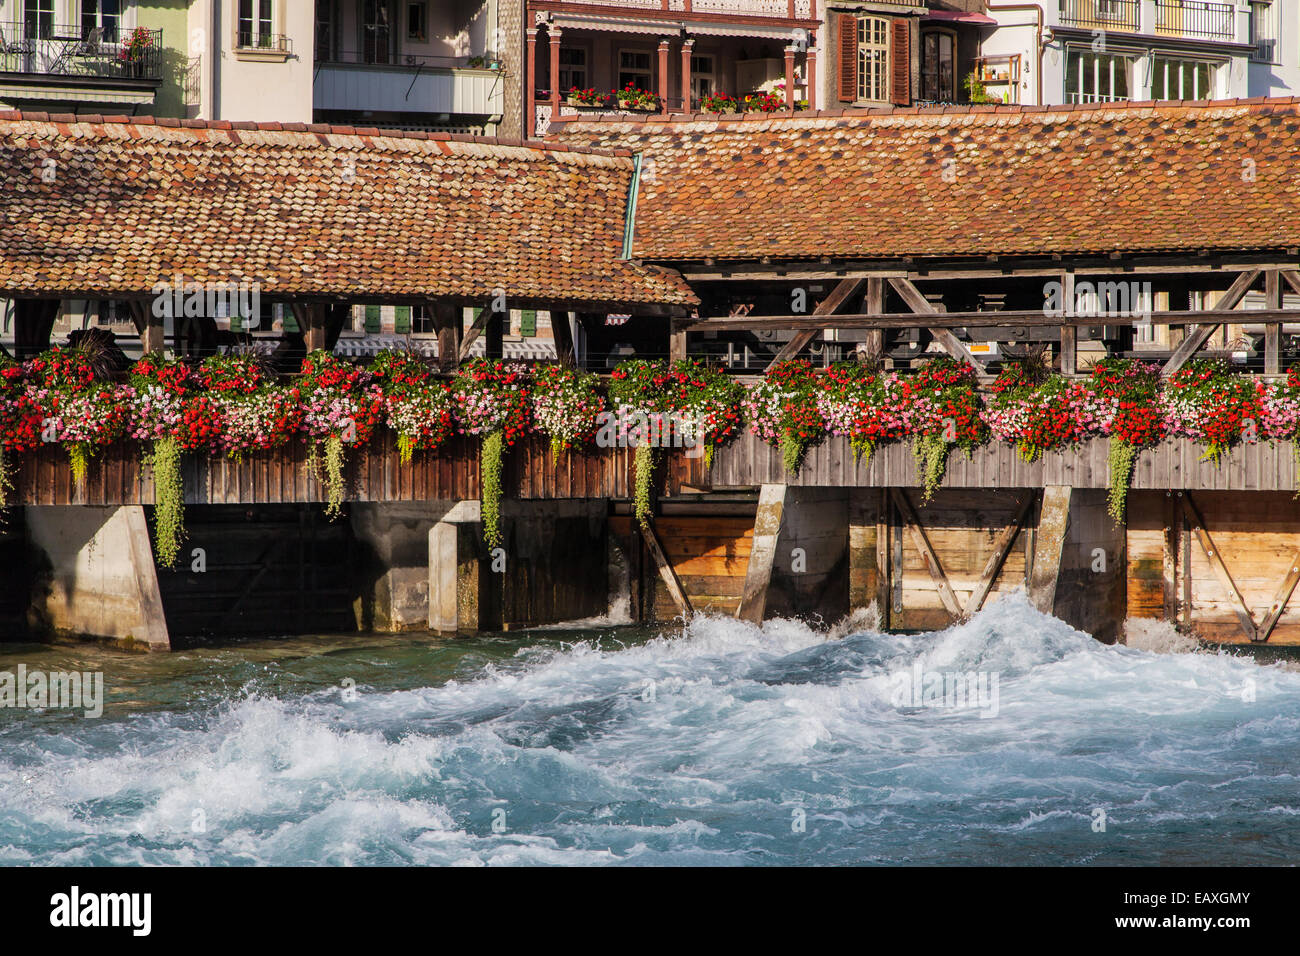 Flower bridge in Thun, Switzerland. - Stock Image